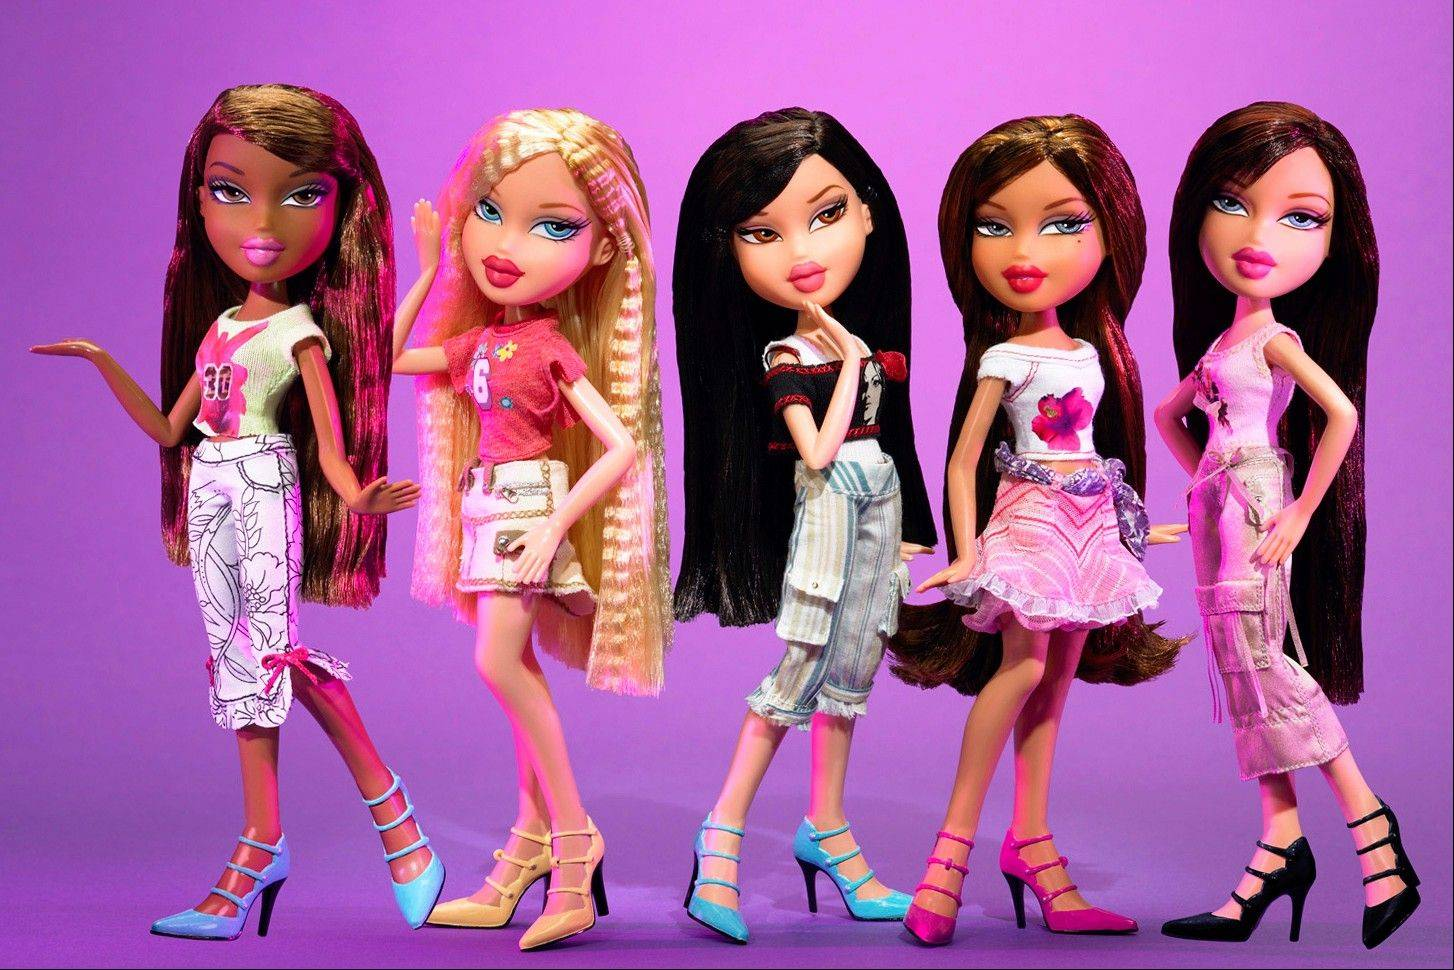 Barbie busty raised eyebrow